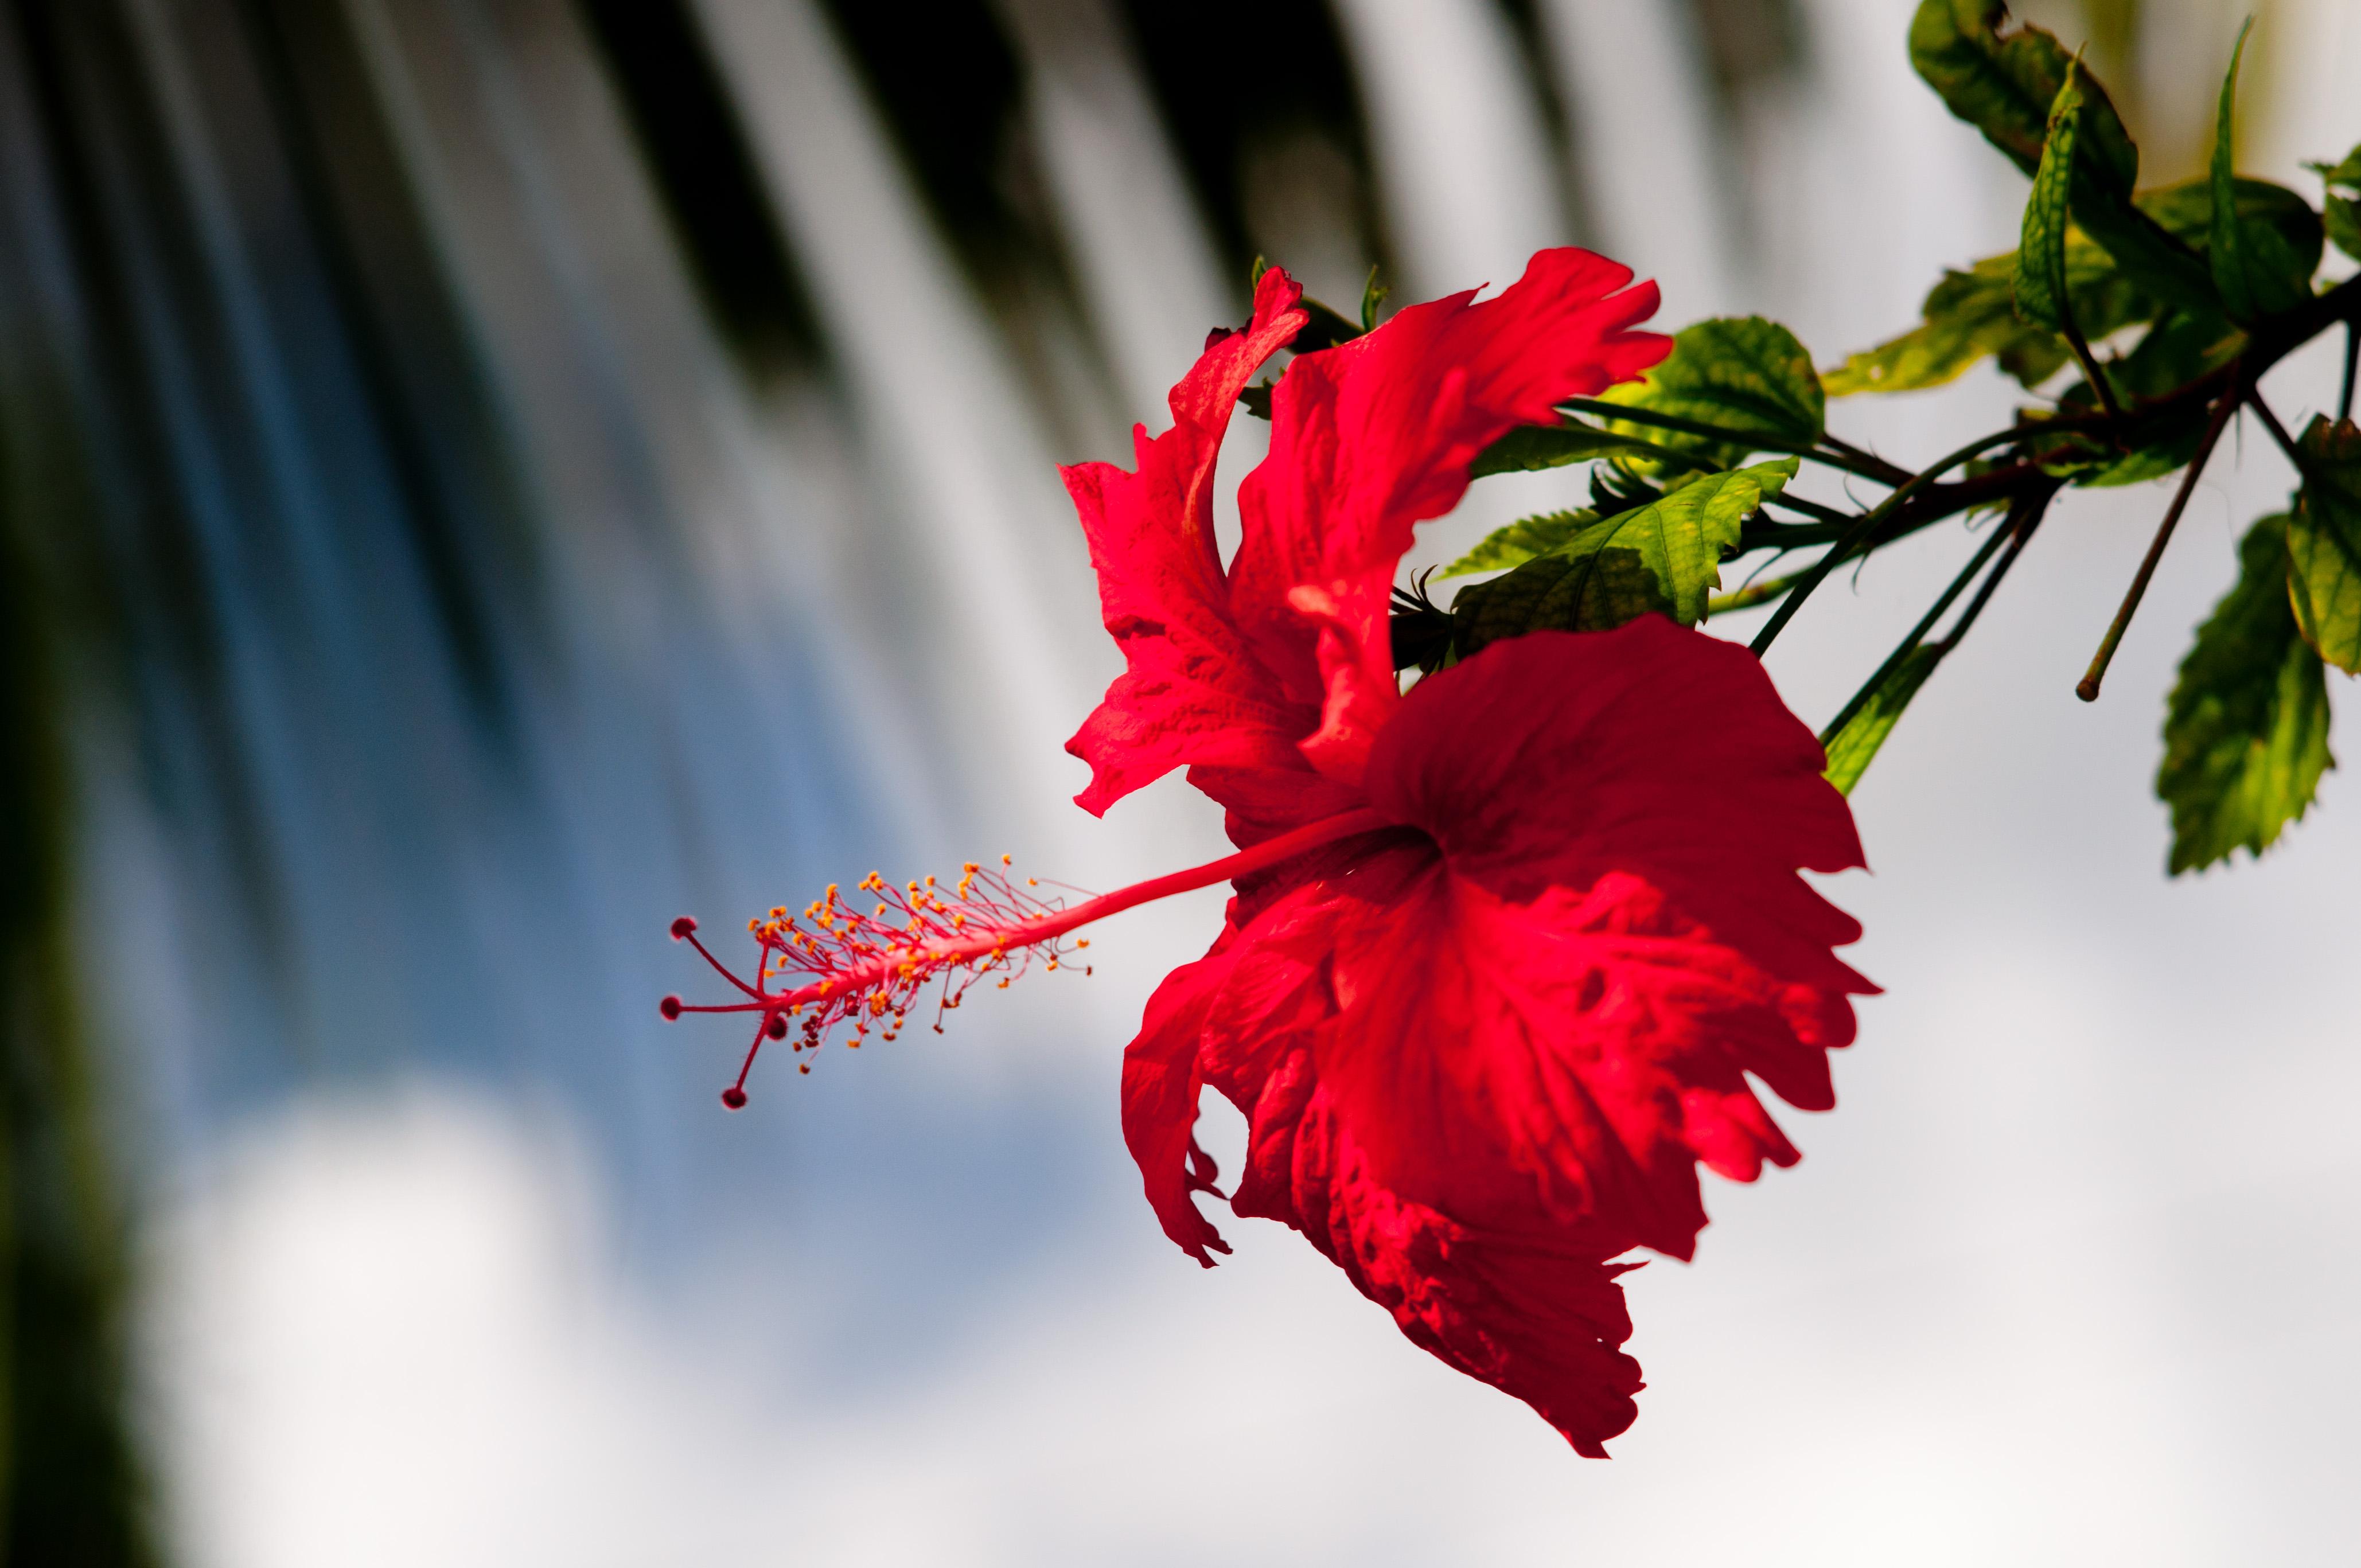 Filehibiscus flower imagicity 622g wikimedia commons filehibiscus flower imagicity 622g izmirmasajfo